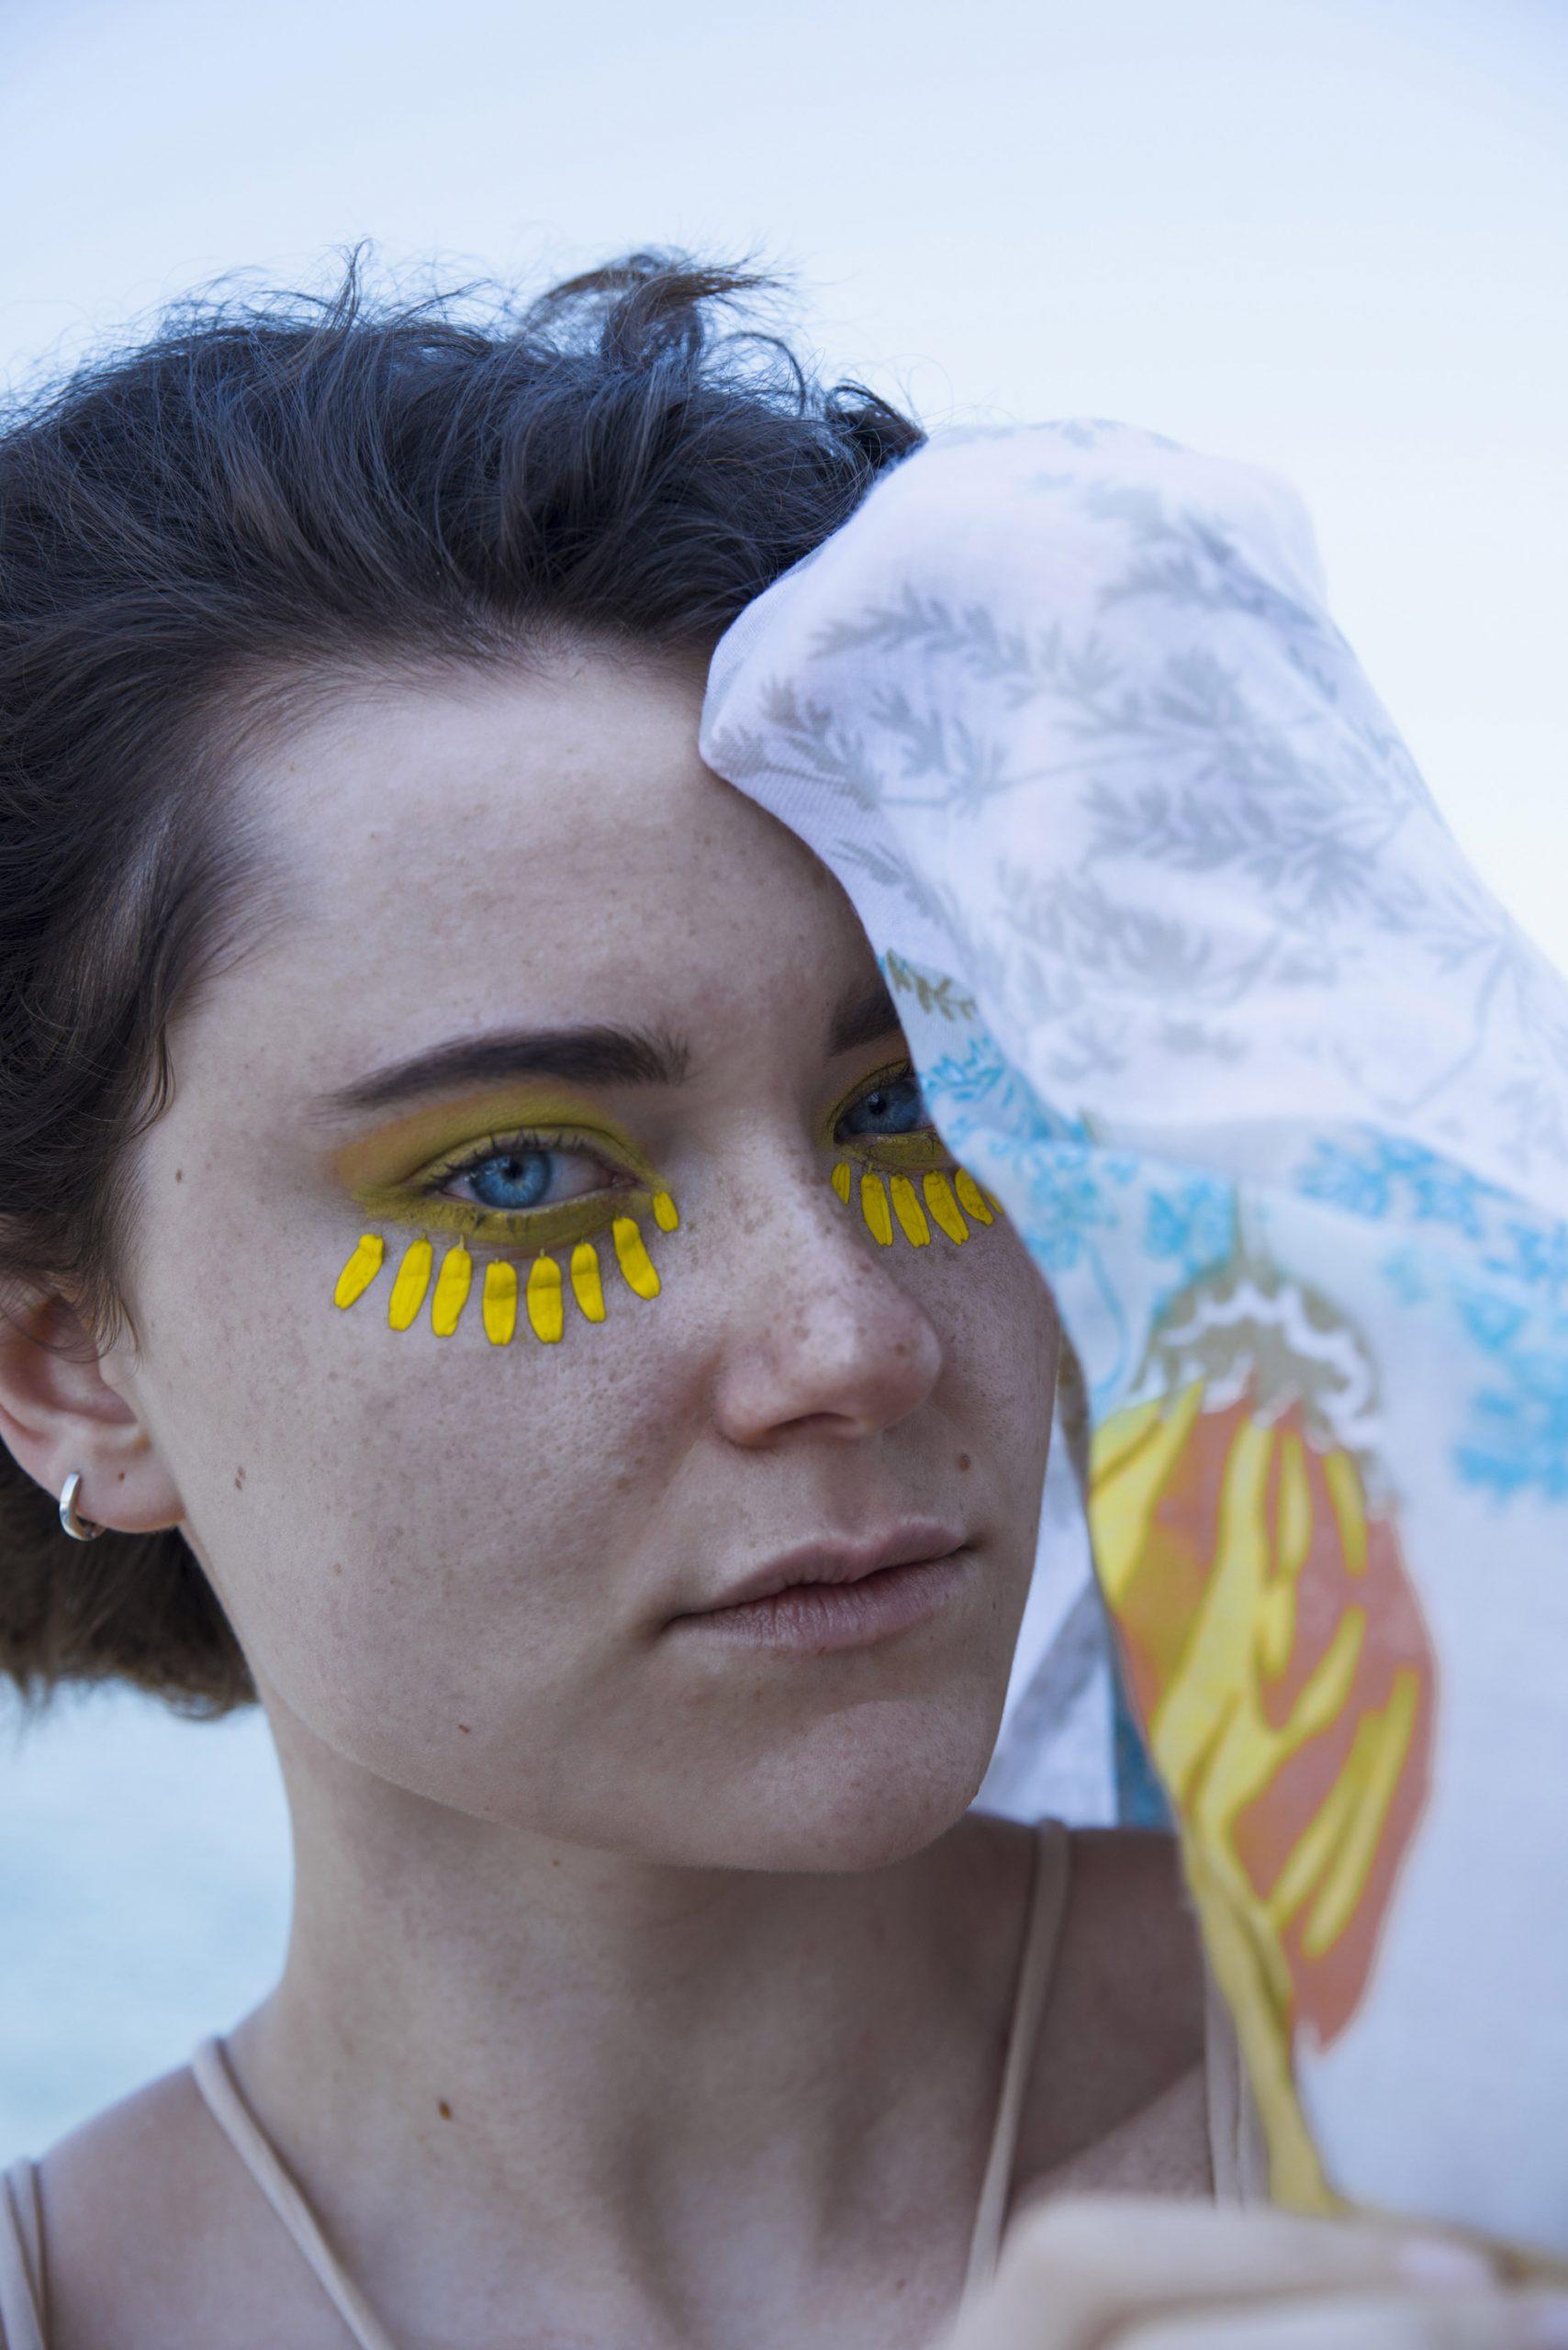 Categorie: Glamour, Portrait; Photographer: AURORA LIPERINI; Model: OLGA KICHYK; Location: Livorno, LI, Italia